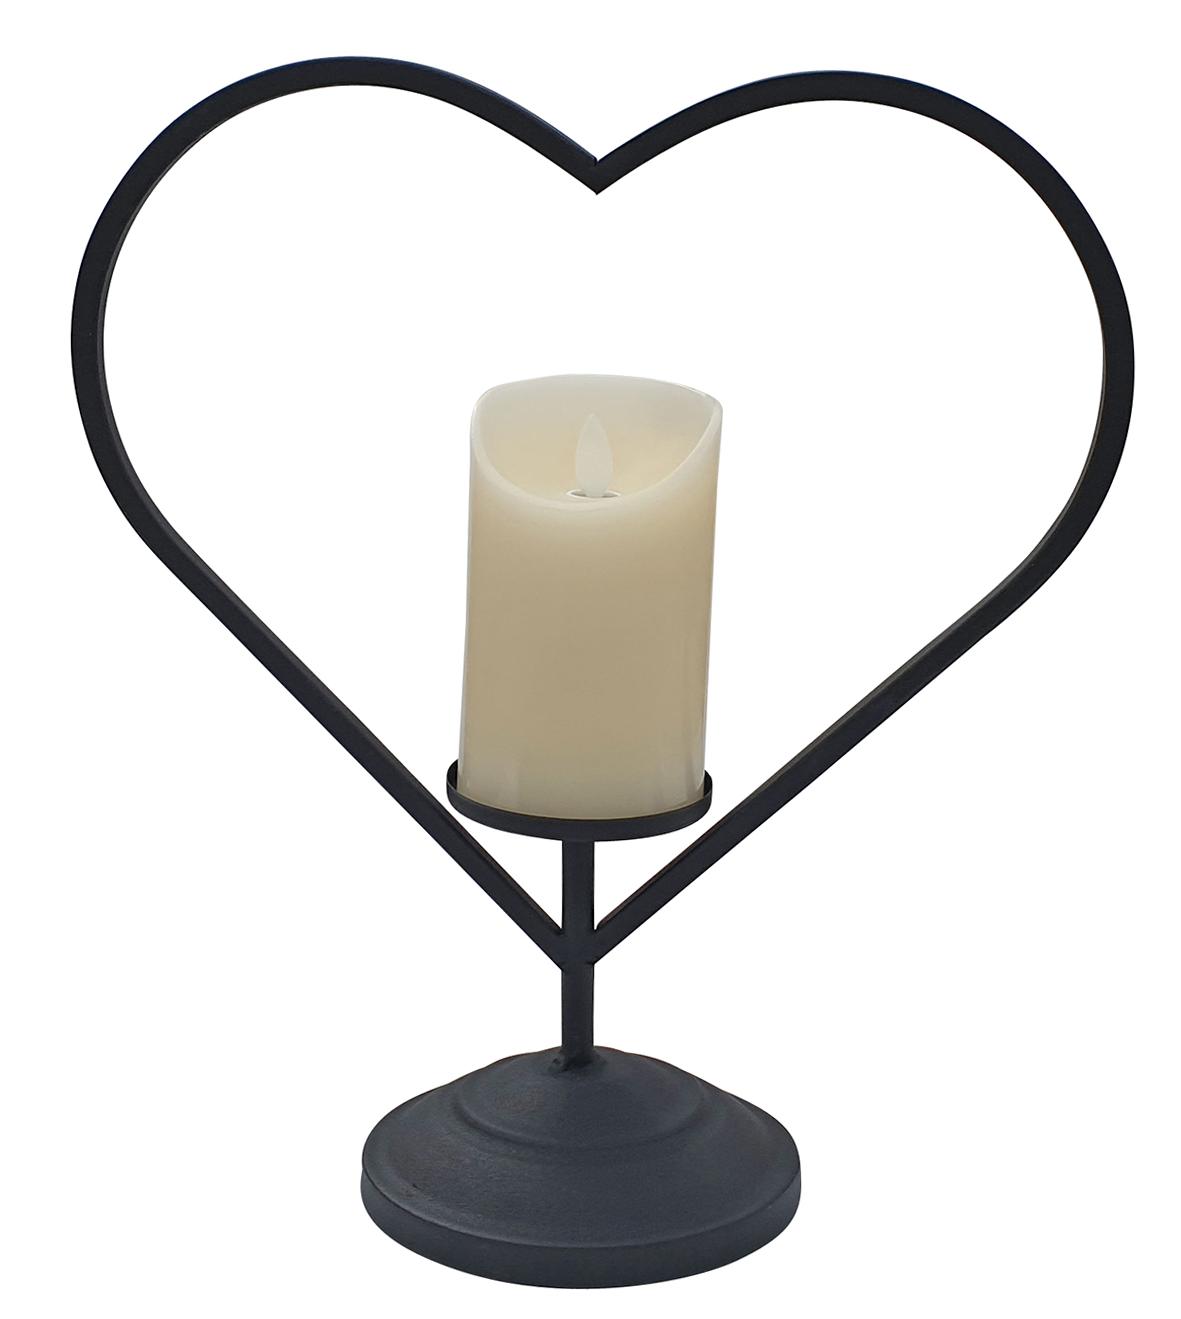 Laterne Metall schwarz Herz mit LED-Kerze Flackereffekt 34 cm hoch Kerzenhalter  001